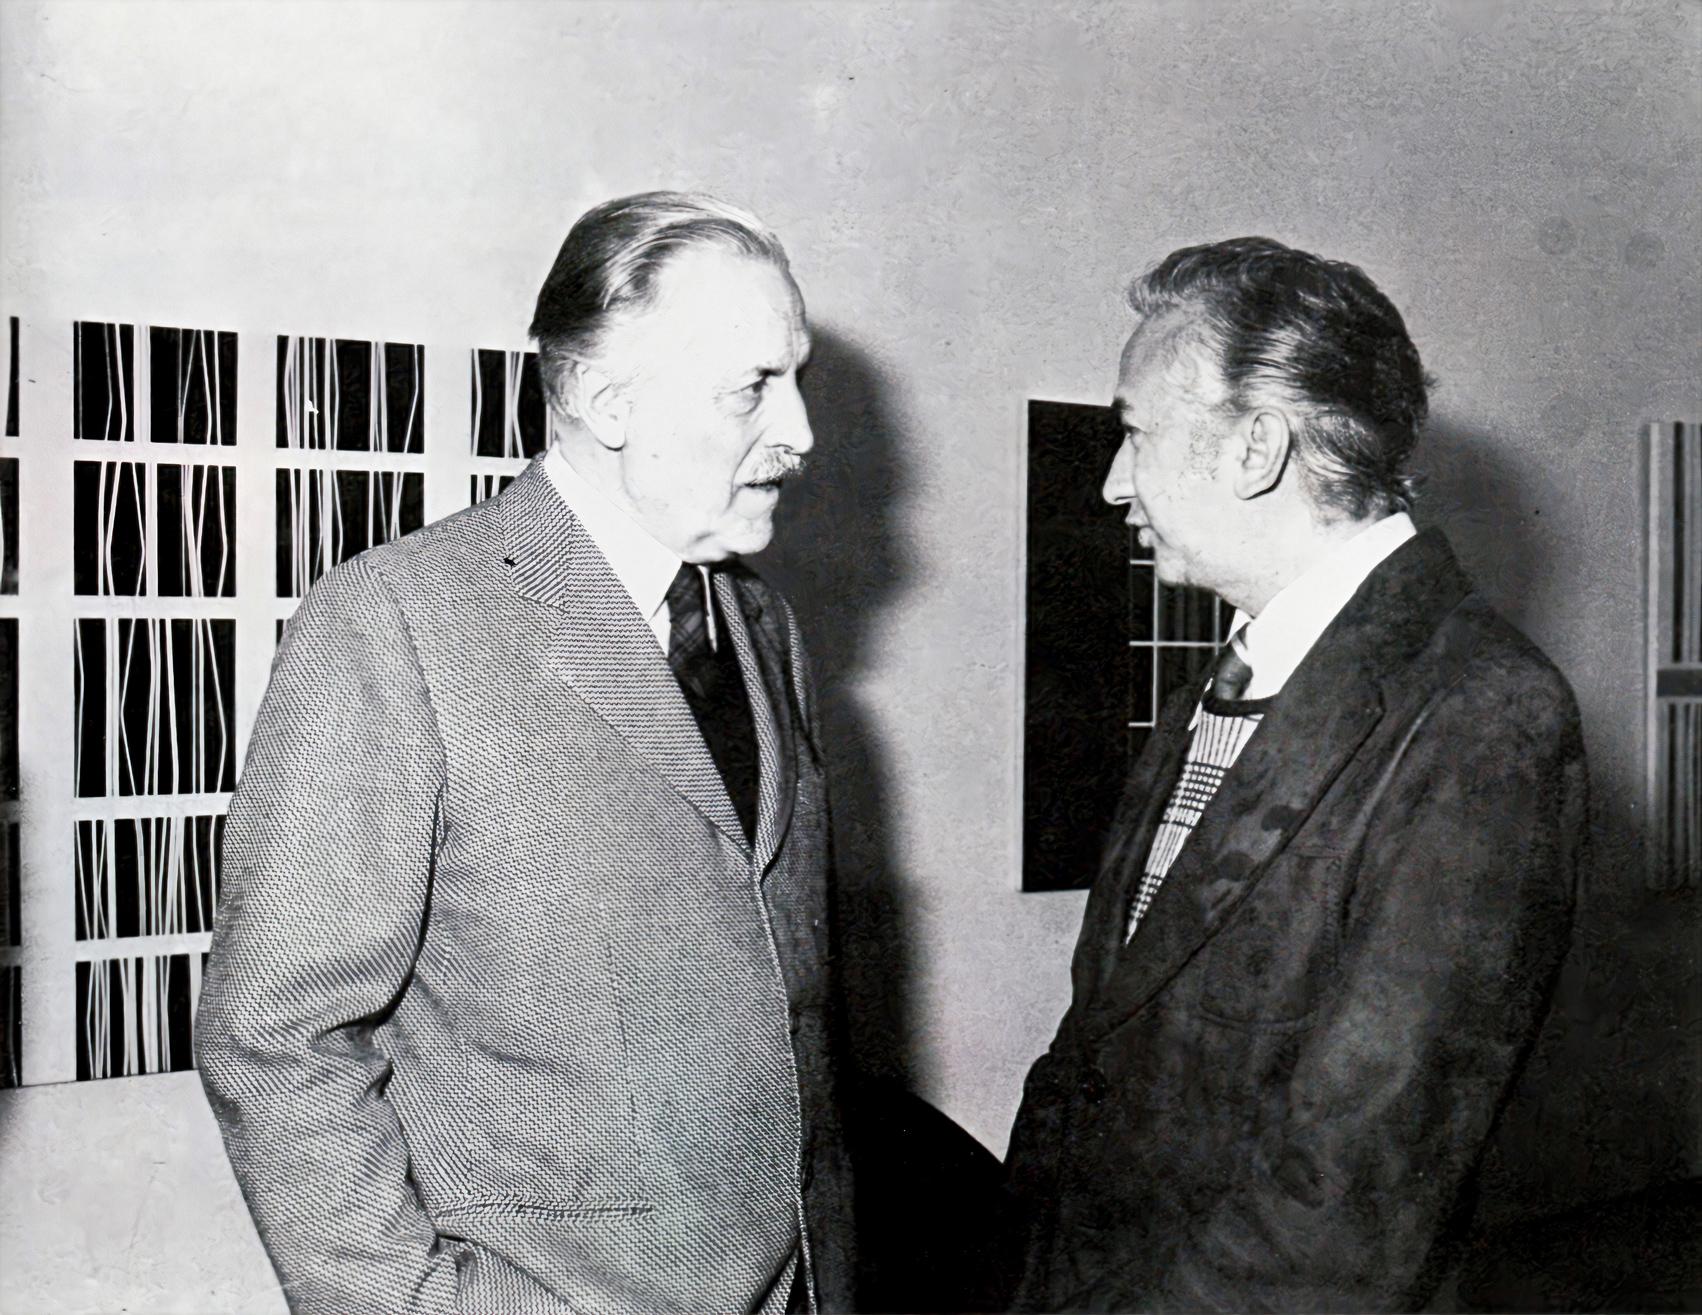 Franco Grignani and Omar Carreño at Marcon IV Gallery, 1976